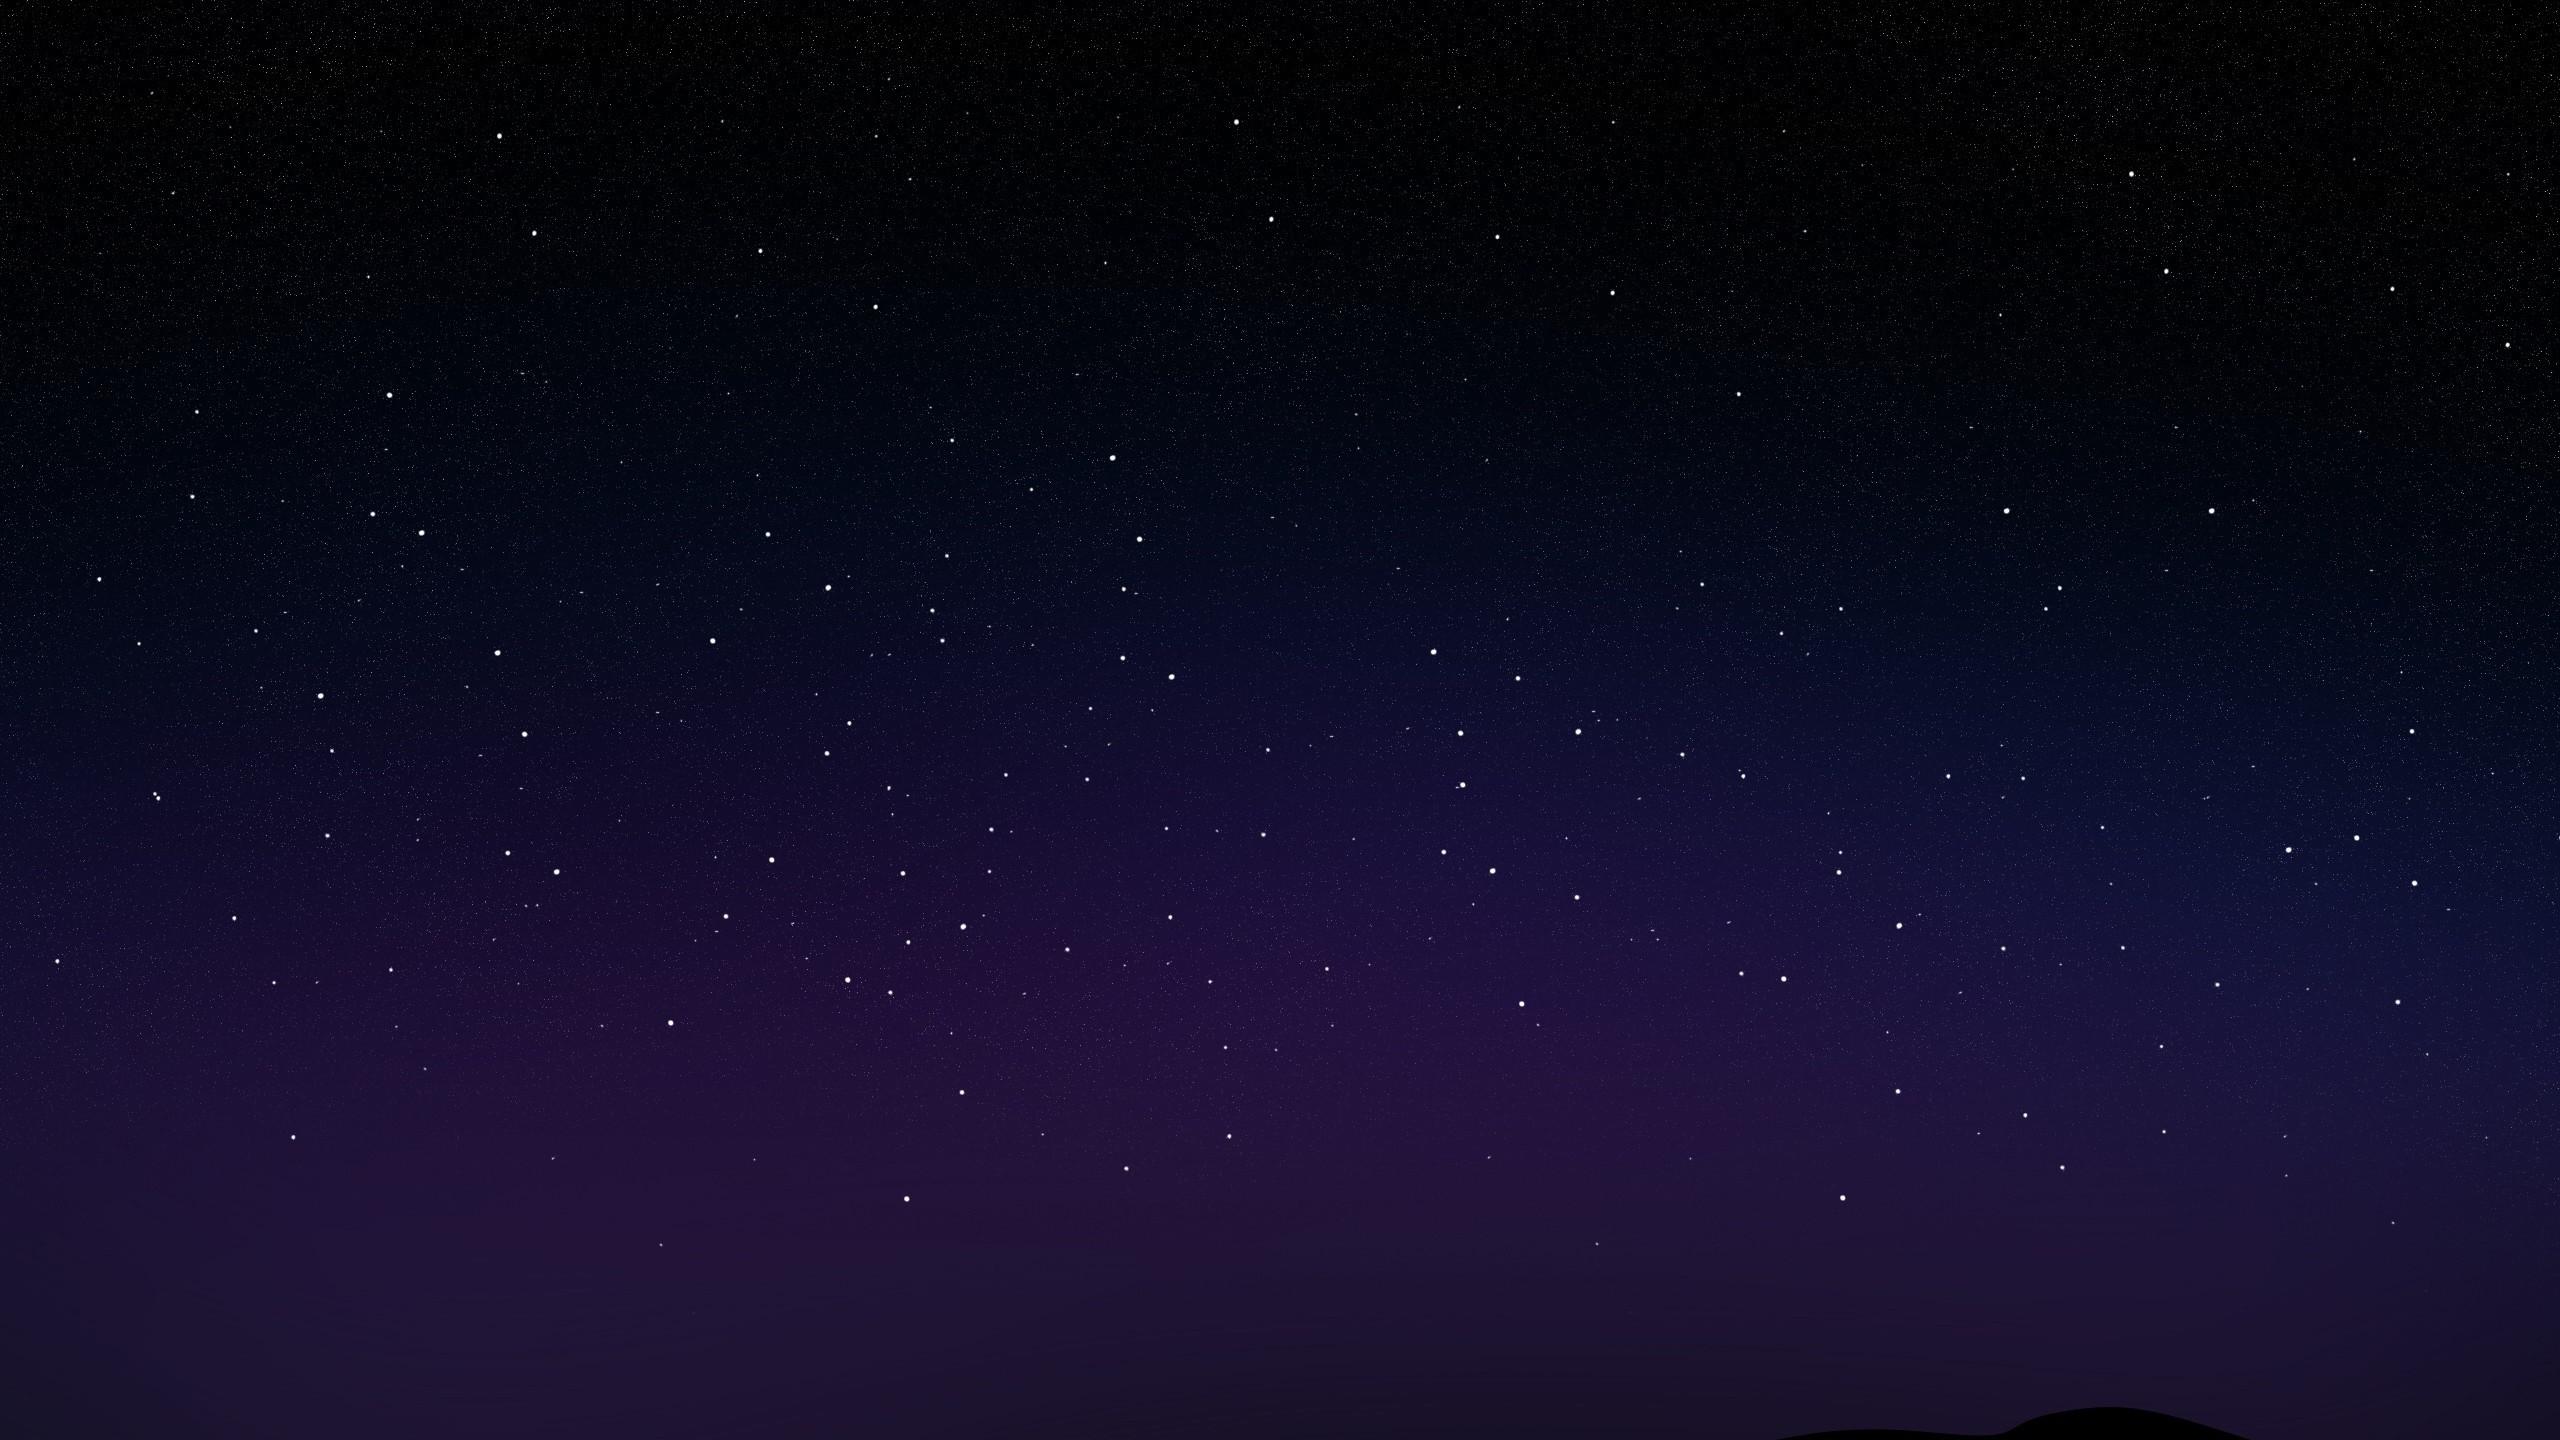 Xiaomi Wallpaper Blue Black: HD Wallpaper Night Sky (70+ Images